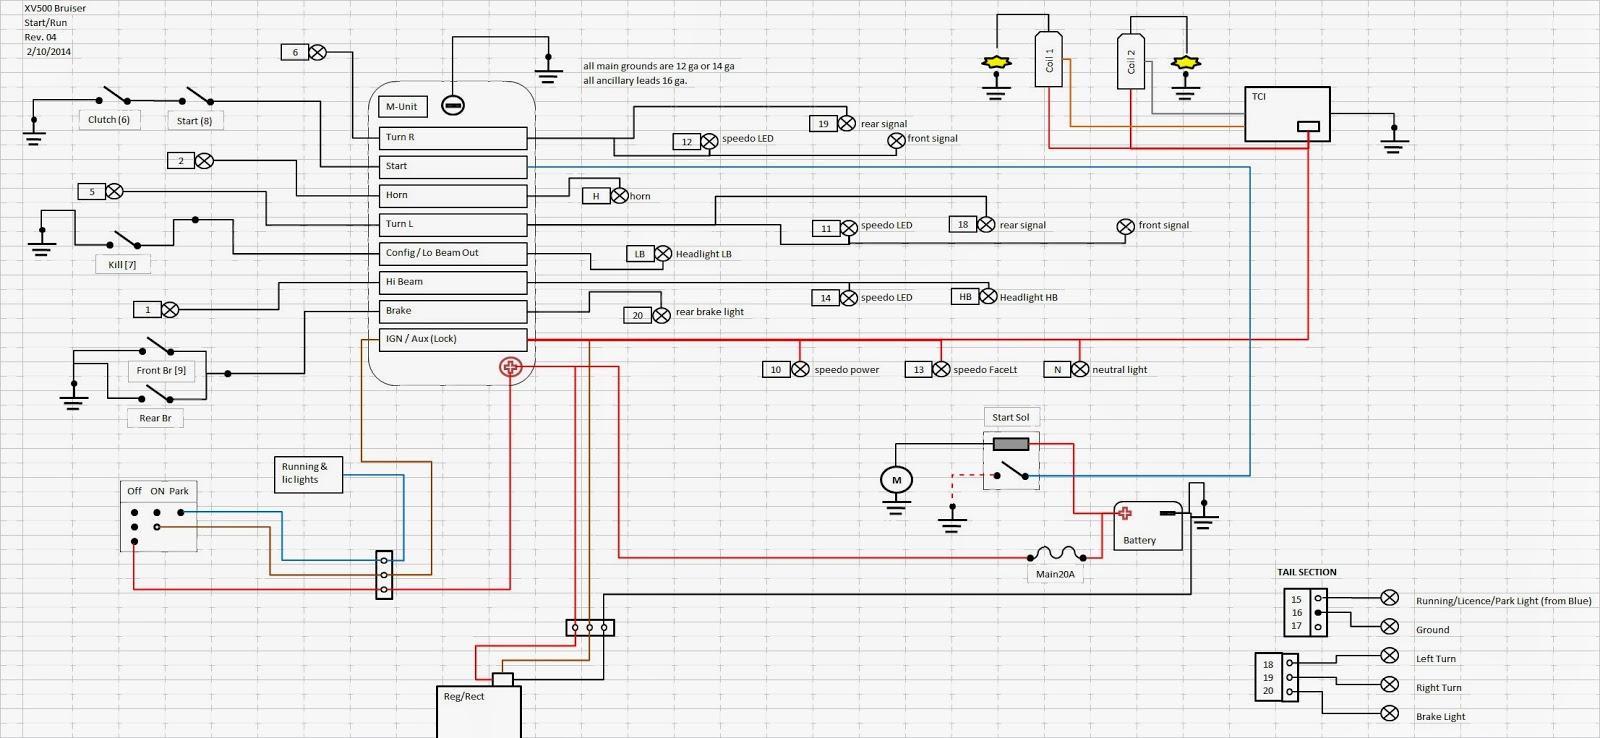 Motogadget M-unit Troubleshoot (SOLVED!!) on jensen wiring diagram, champion wiring diagram, hogtunes wiring diagram, mallory ignition wiring diagram, ctek wiring diagram, jbl wiring diagram, dynatek wiring diagram, metalux wiring diagram, kuryakyn wiring diagram, kicker wiring diagram, s100 wiring diagram, koso wiring diagram, acerbis wiring diagram, roaring toyz wiring diagram,